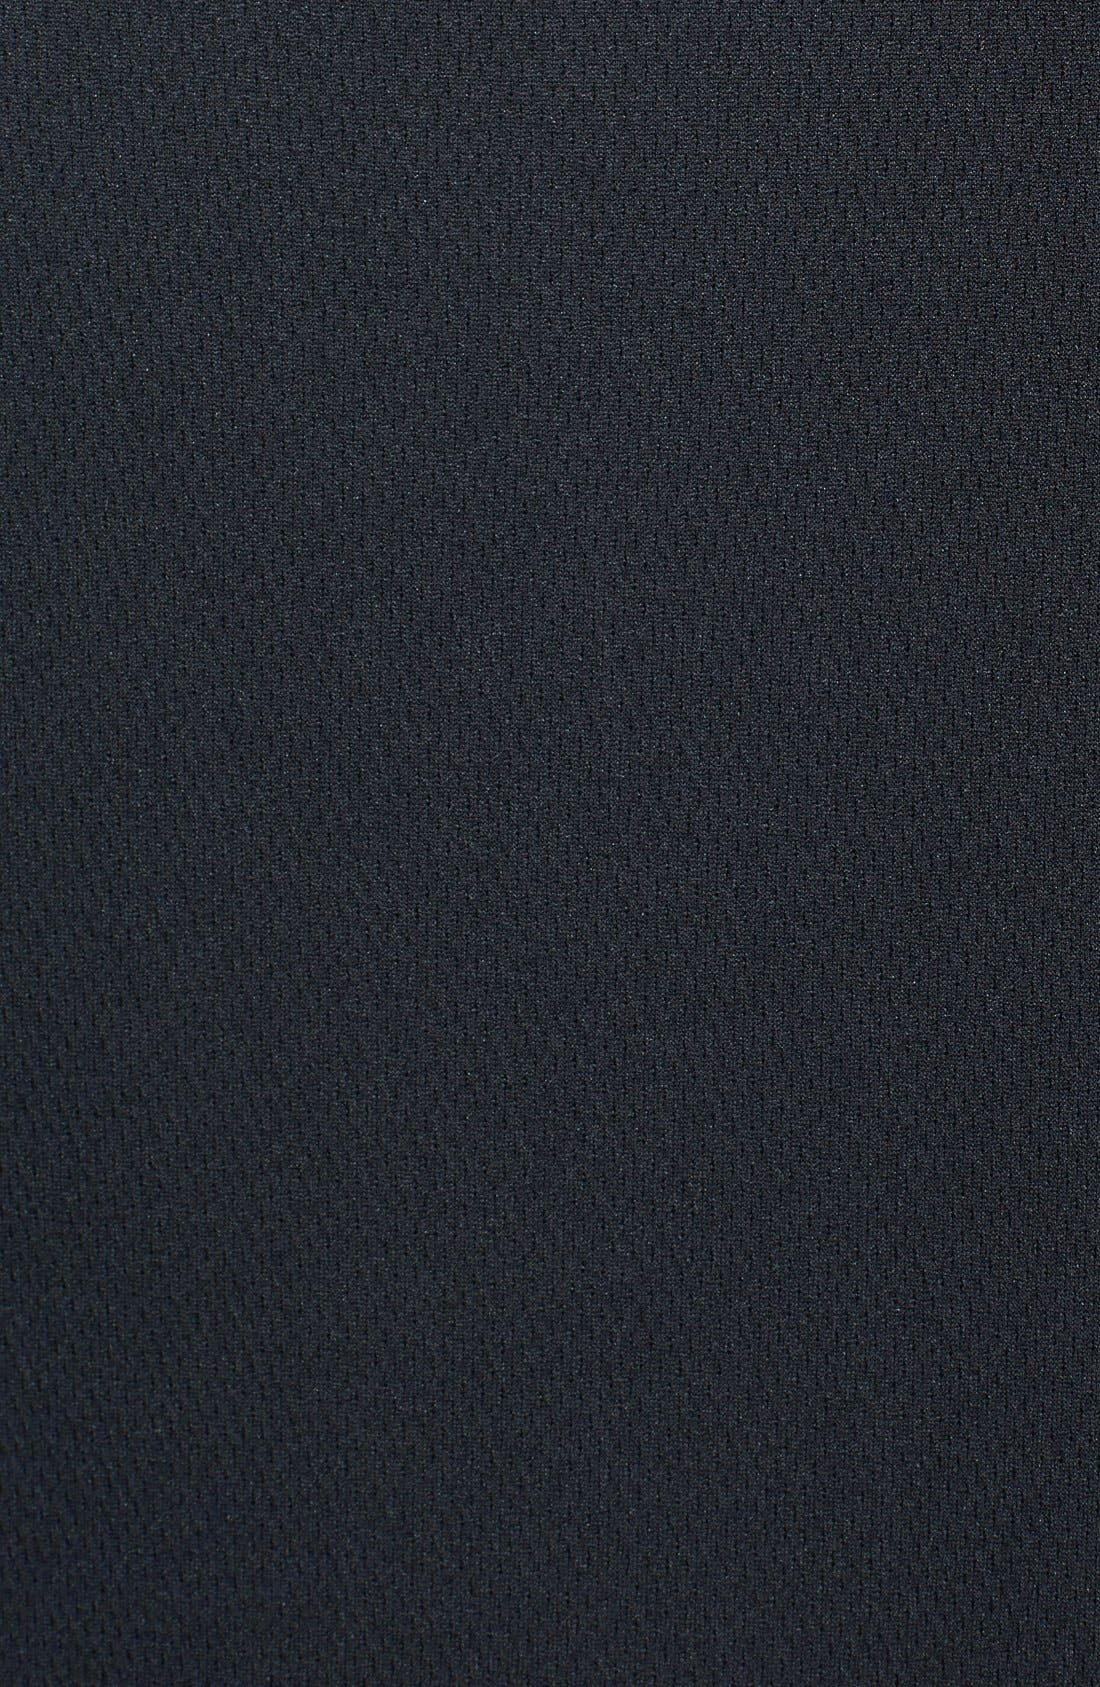 Washington DC NFL Team - Edge DryTec Moisture Wicking Half Zip Pullover,                             Alternate thumbnail 3, color,                             001